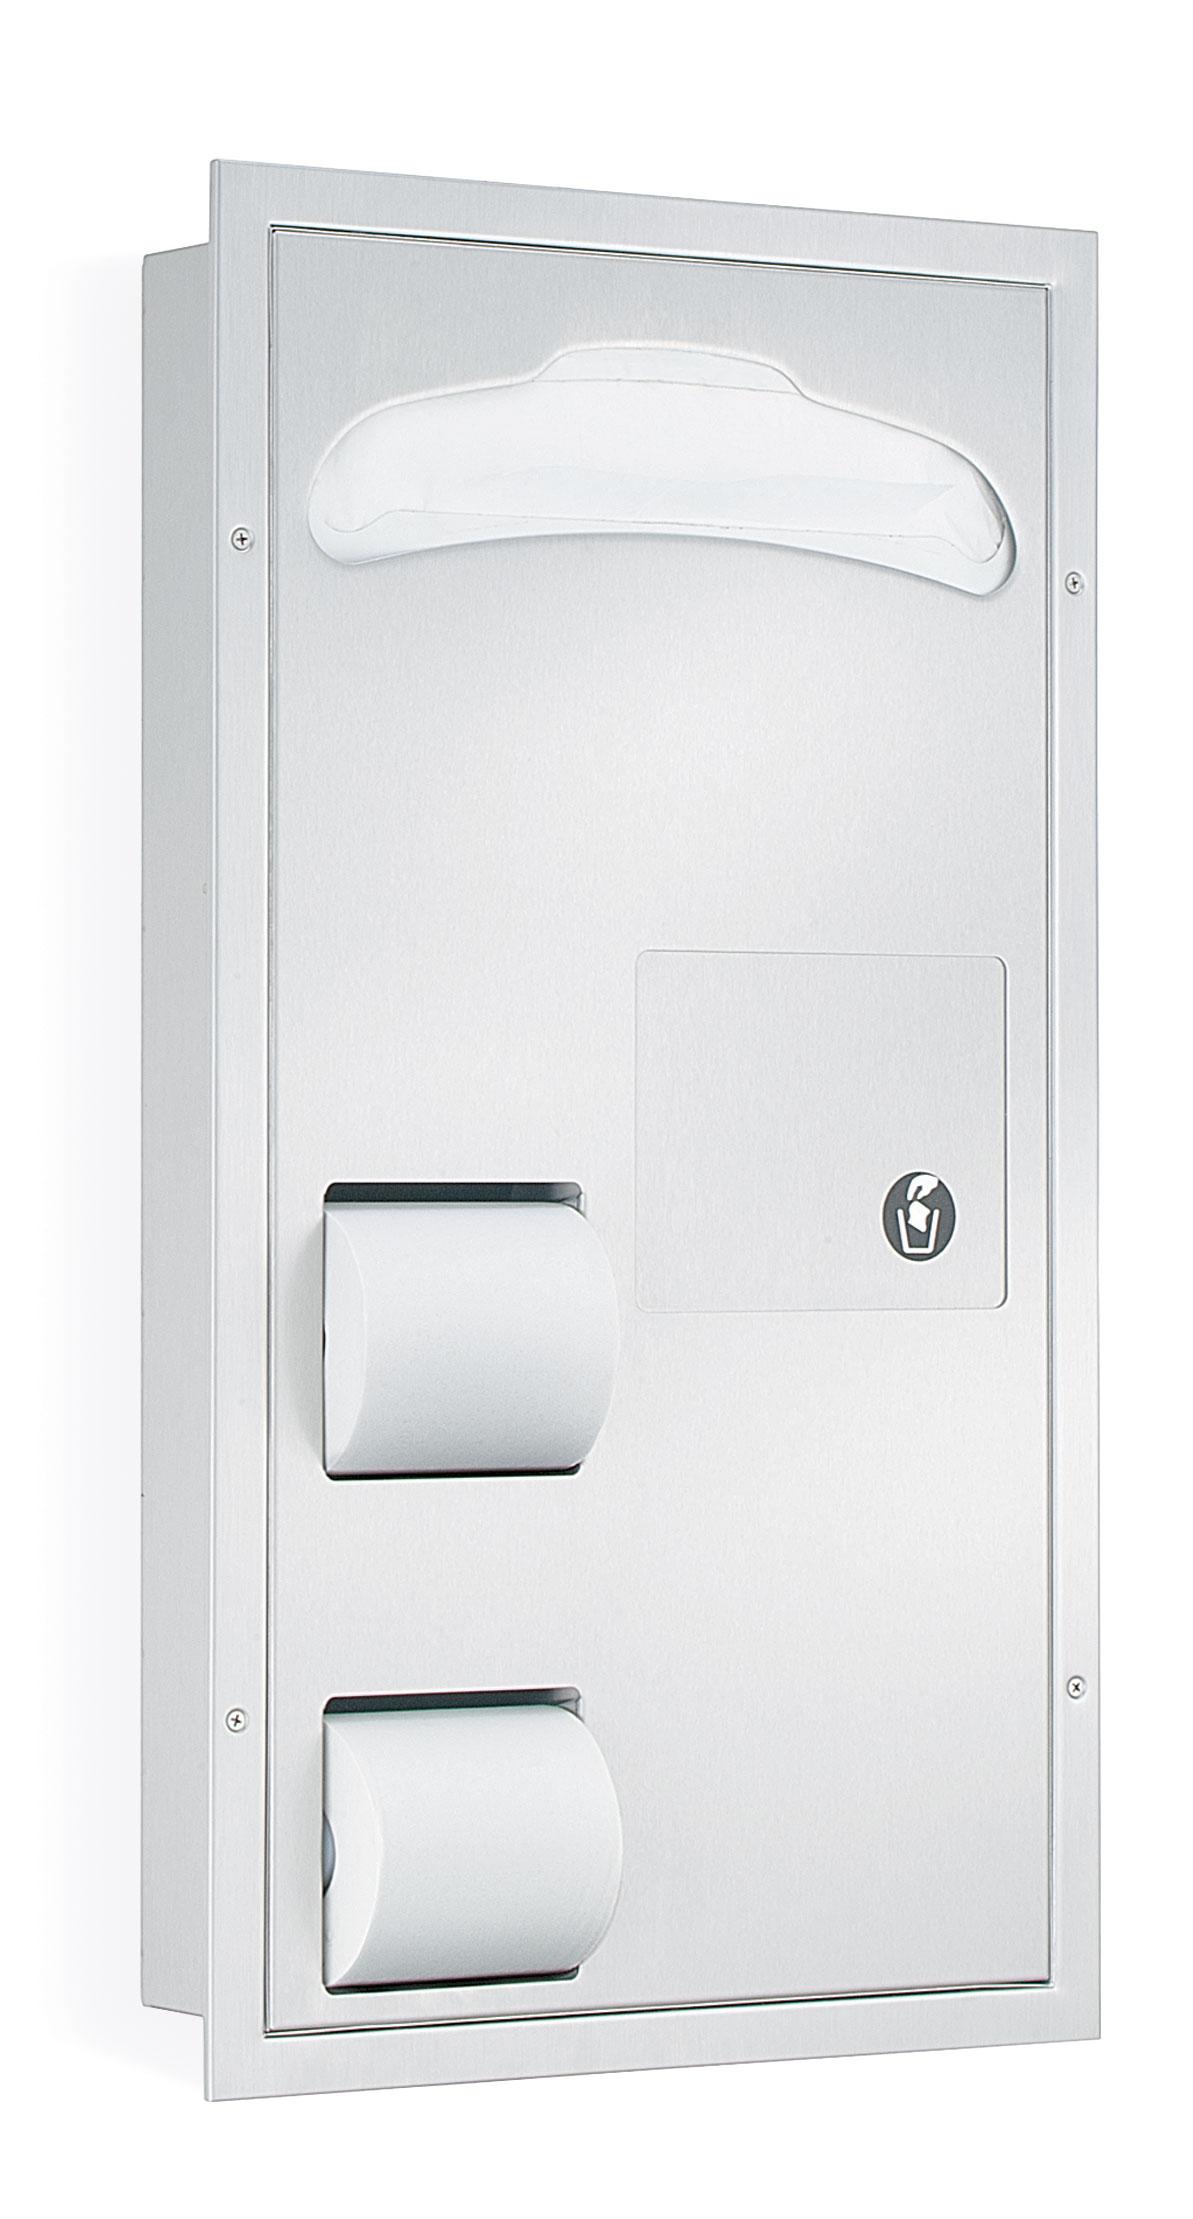 2 Stall Seat Cover Tissue Dispenser Napkin Disposal